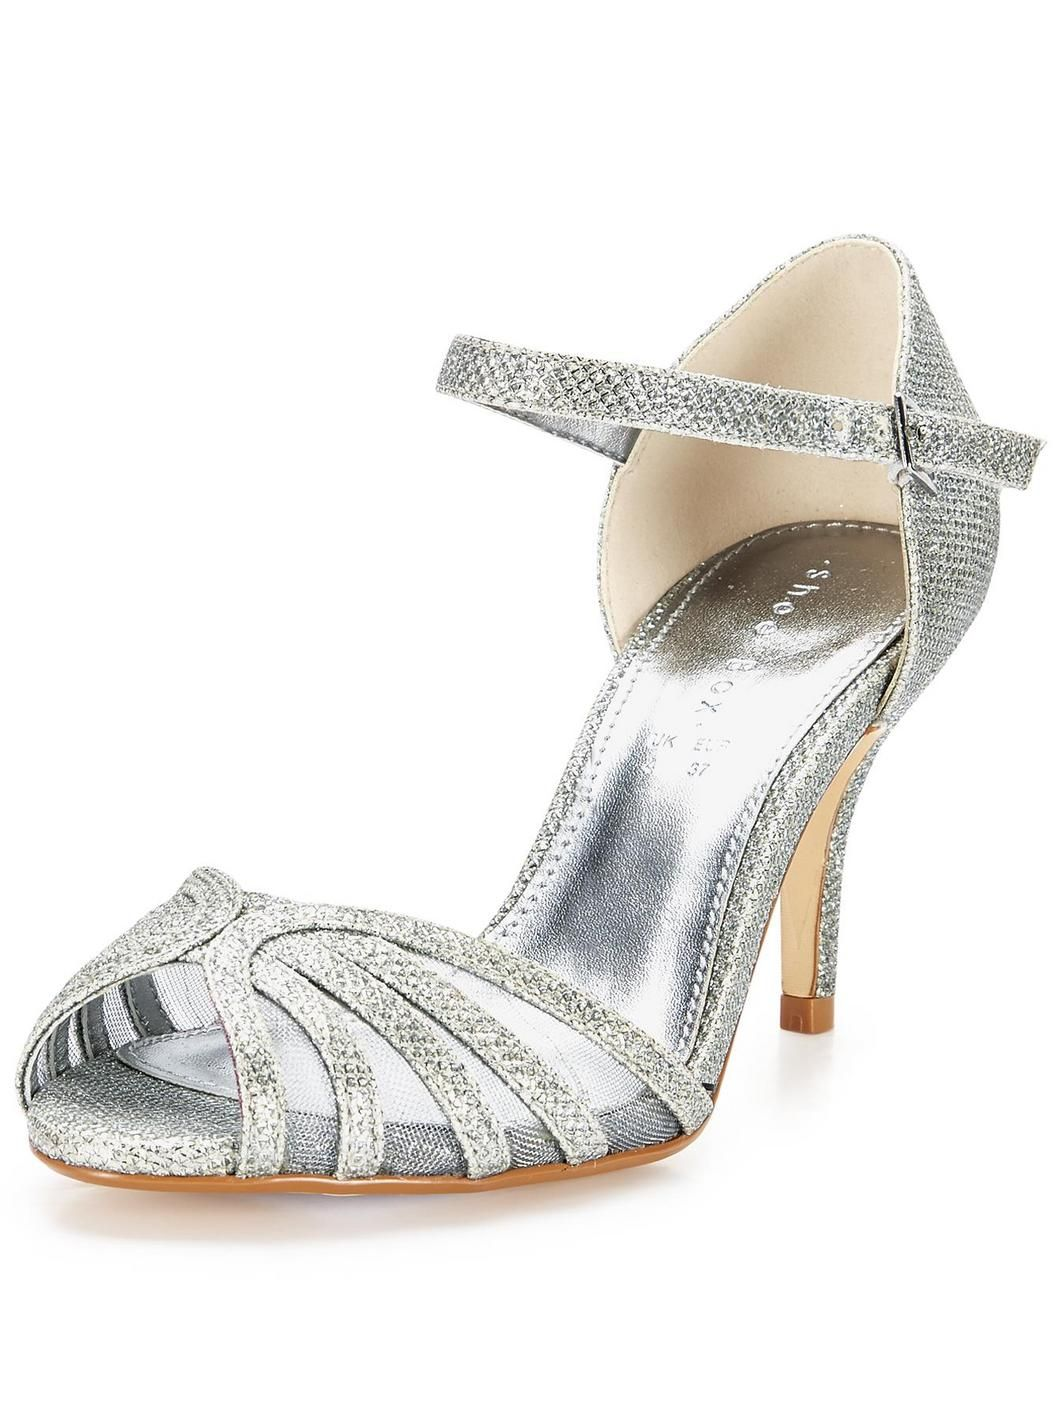 Black sandals littlewoods - Judy Mid Heel Sparkle Sandals Http Www Very Co